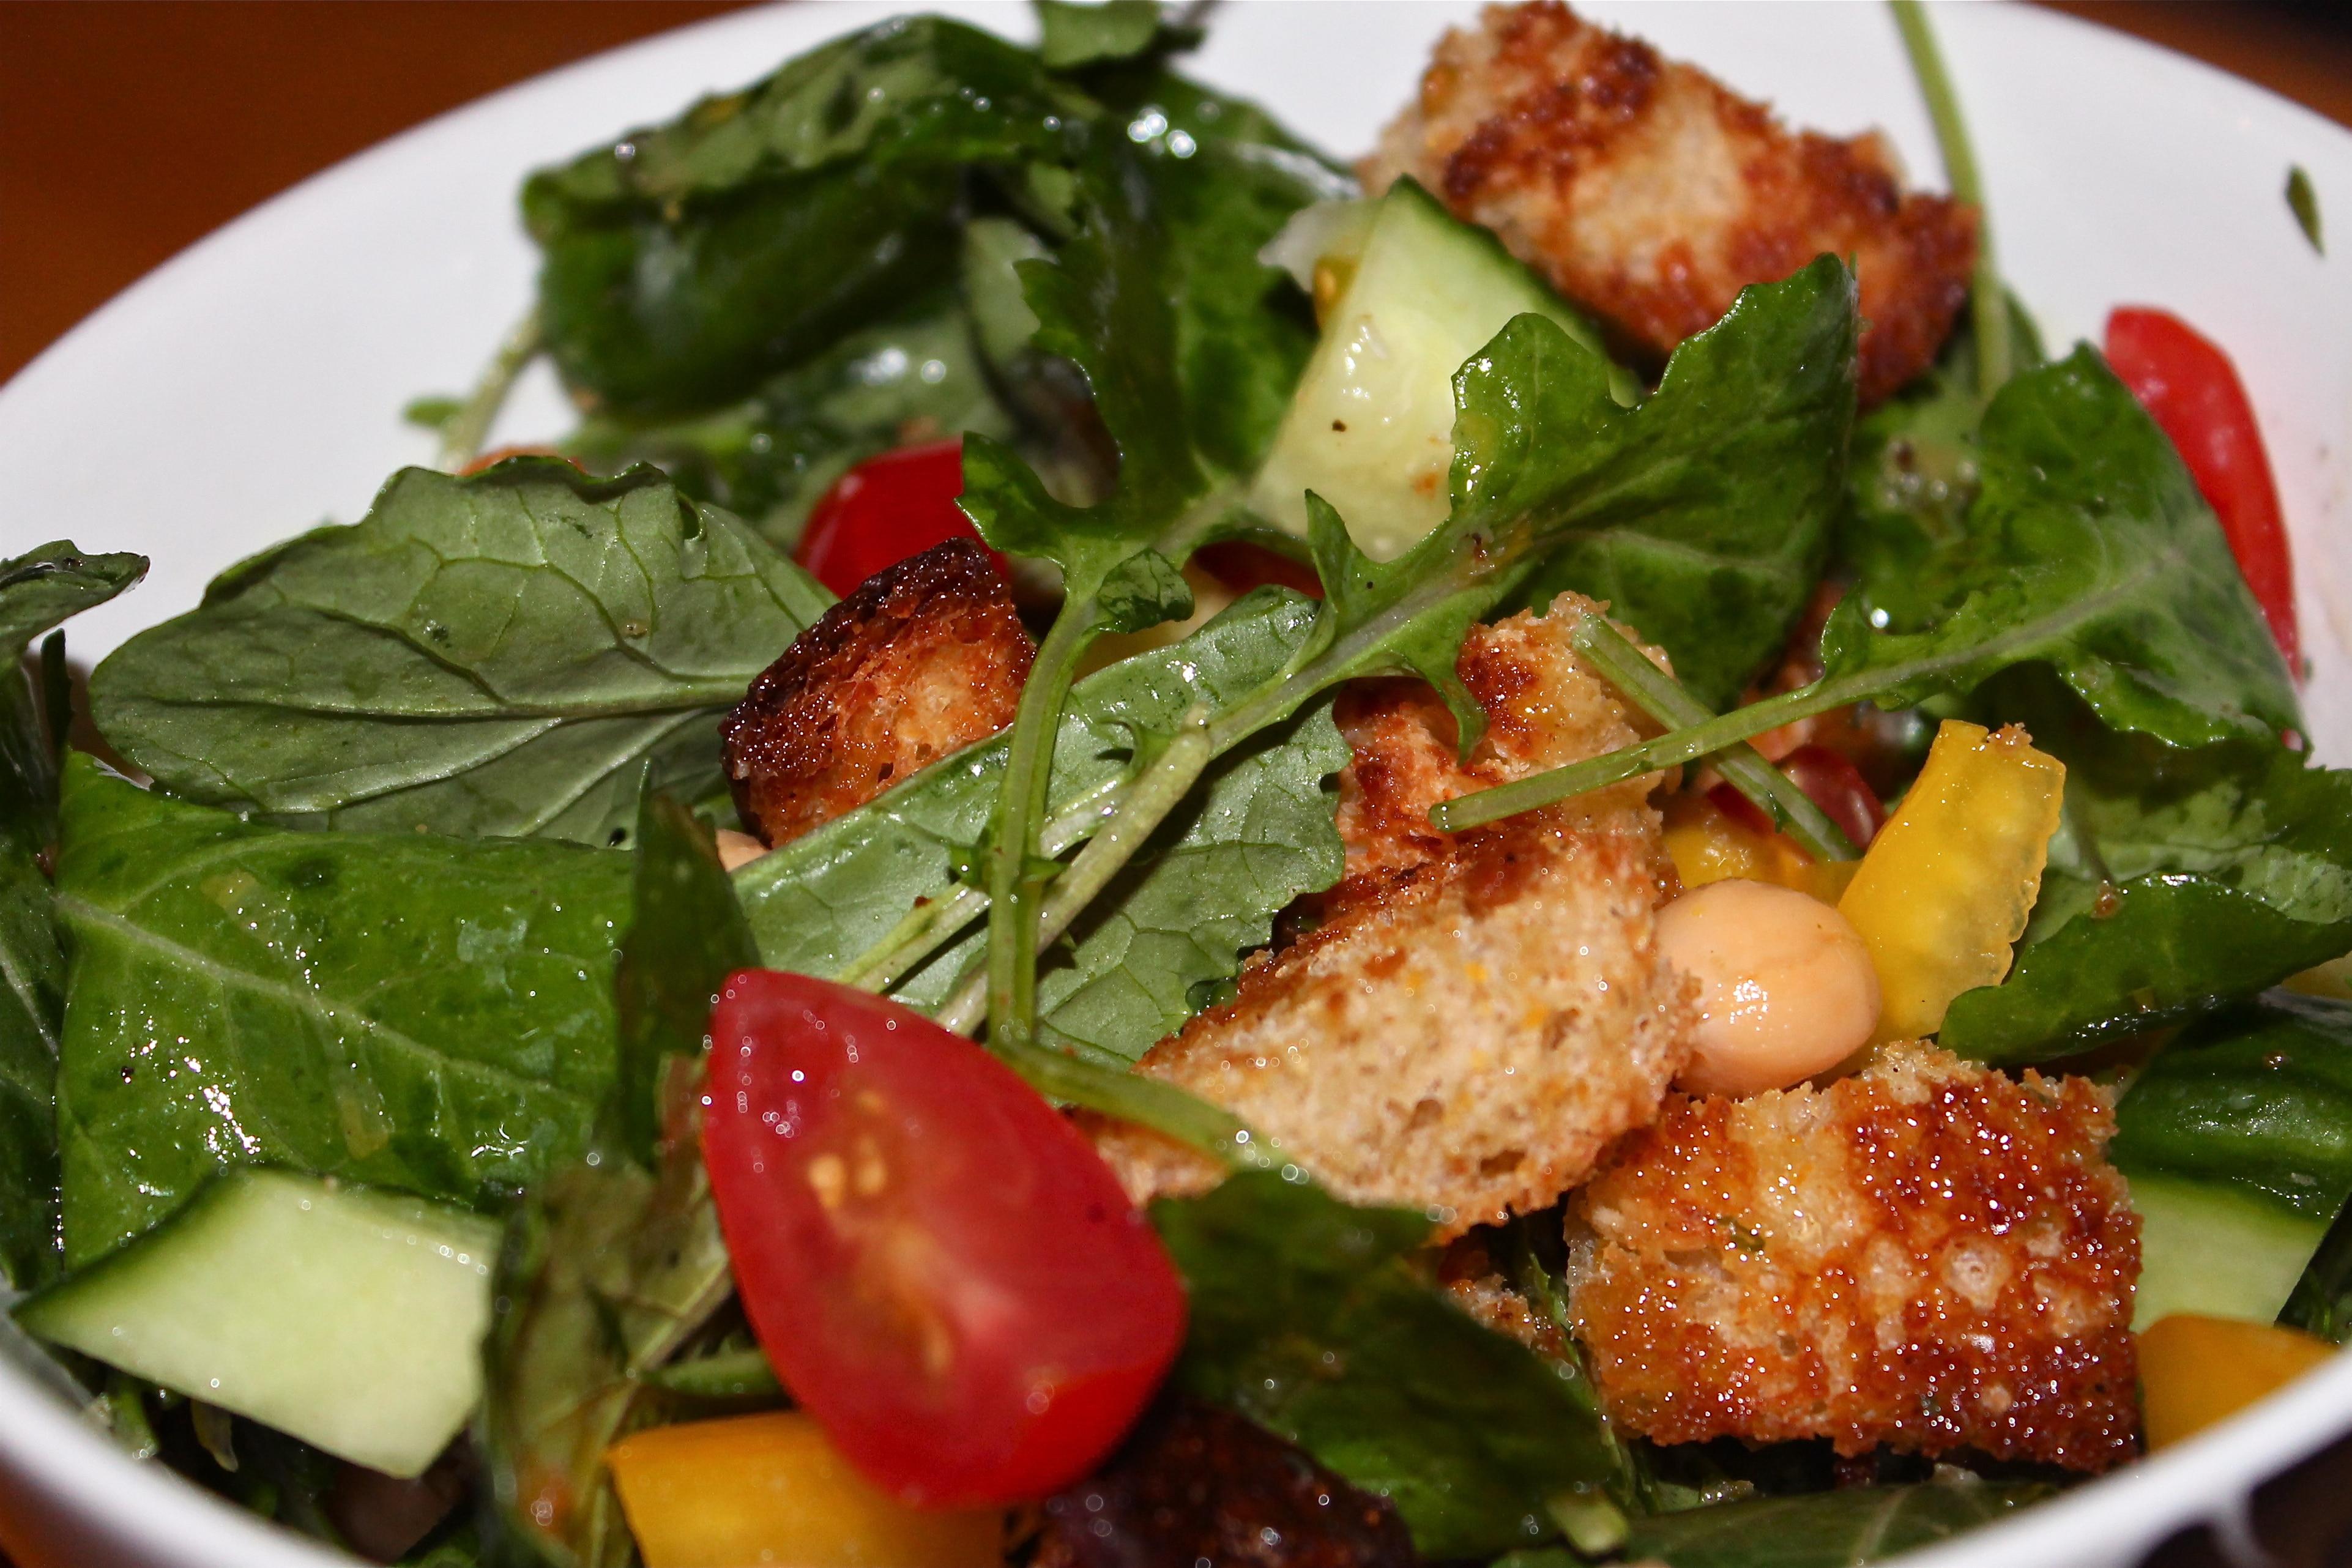 Panzanella Salad with Baby Kale, Chickpeas, and Lemon Herb Vinaigrette